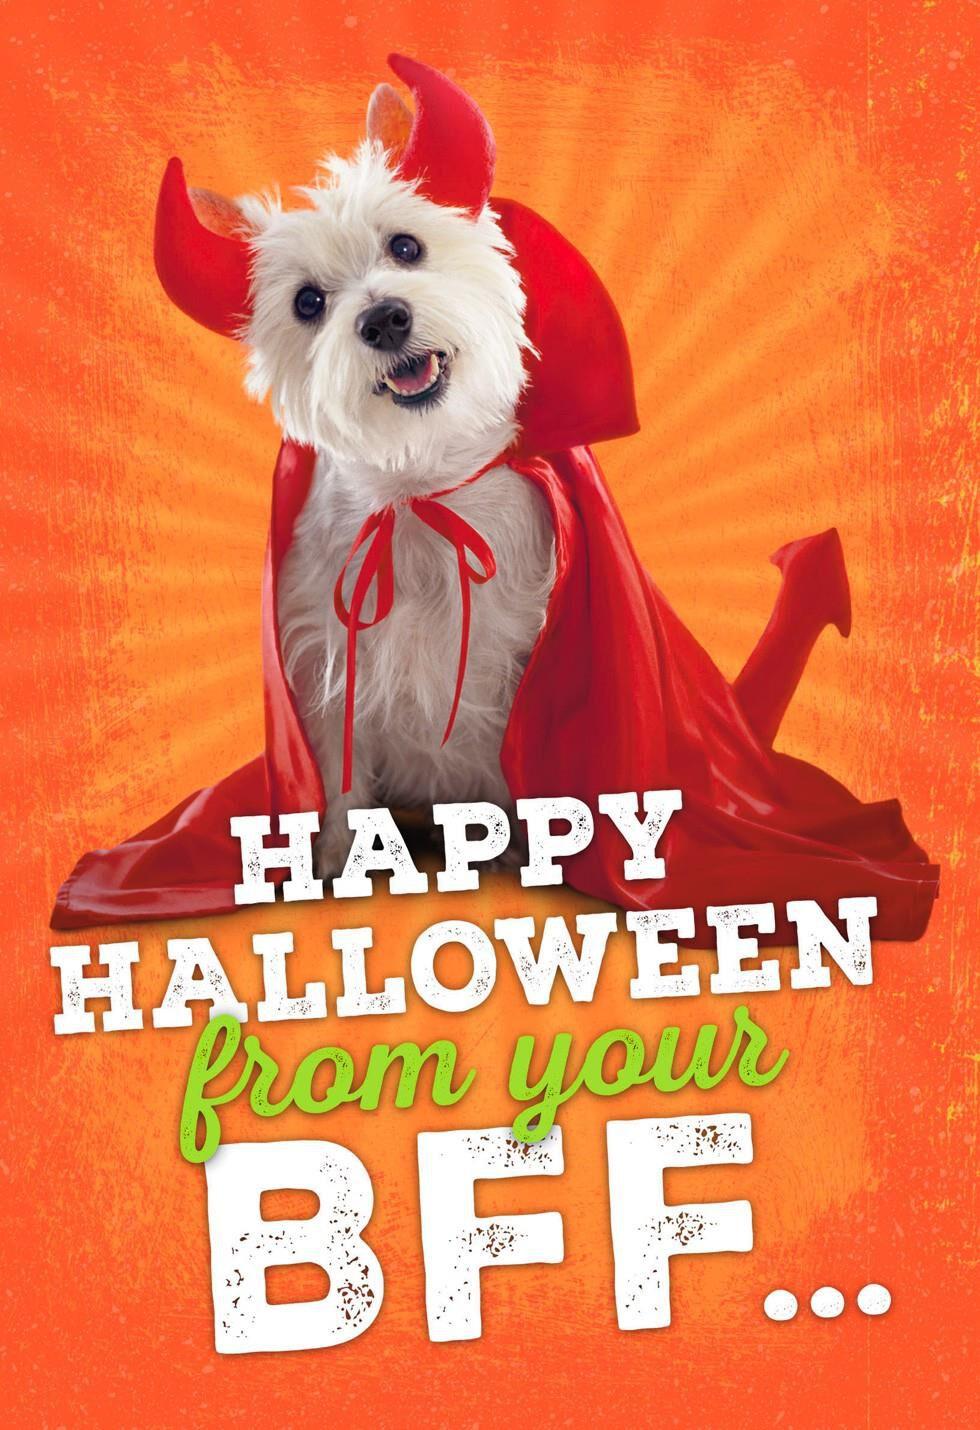 Best furry friend halloween card greeting cards hallmark kristyandbryce Images